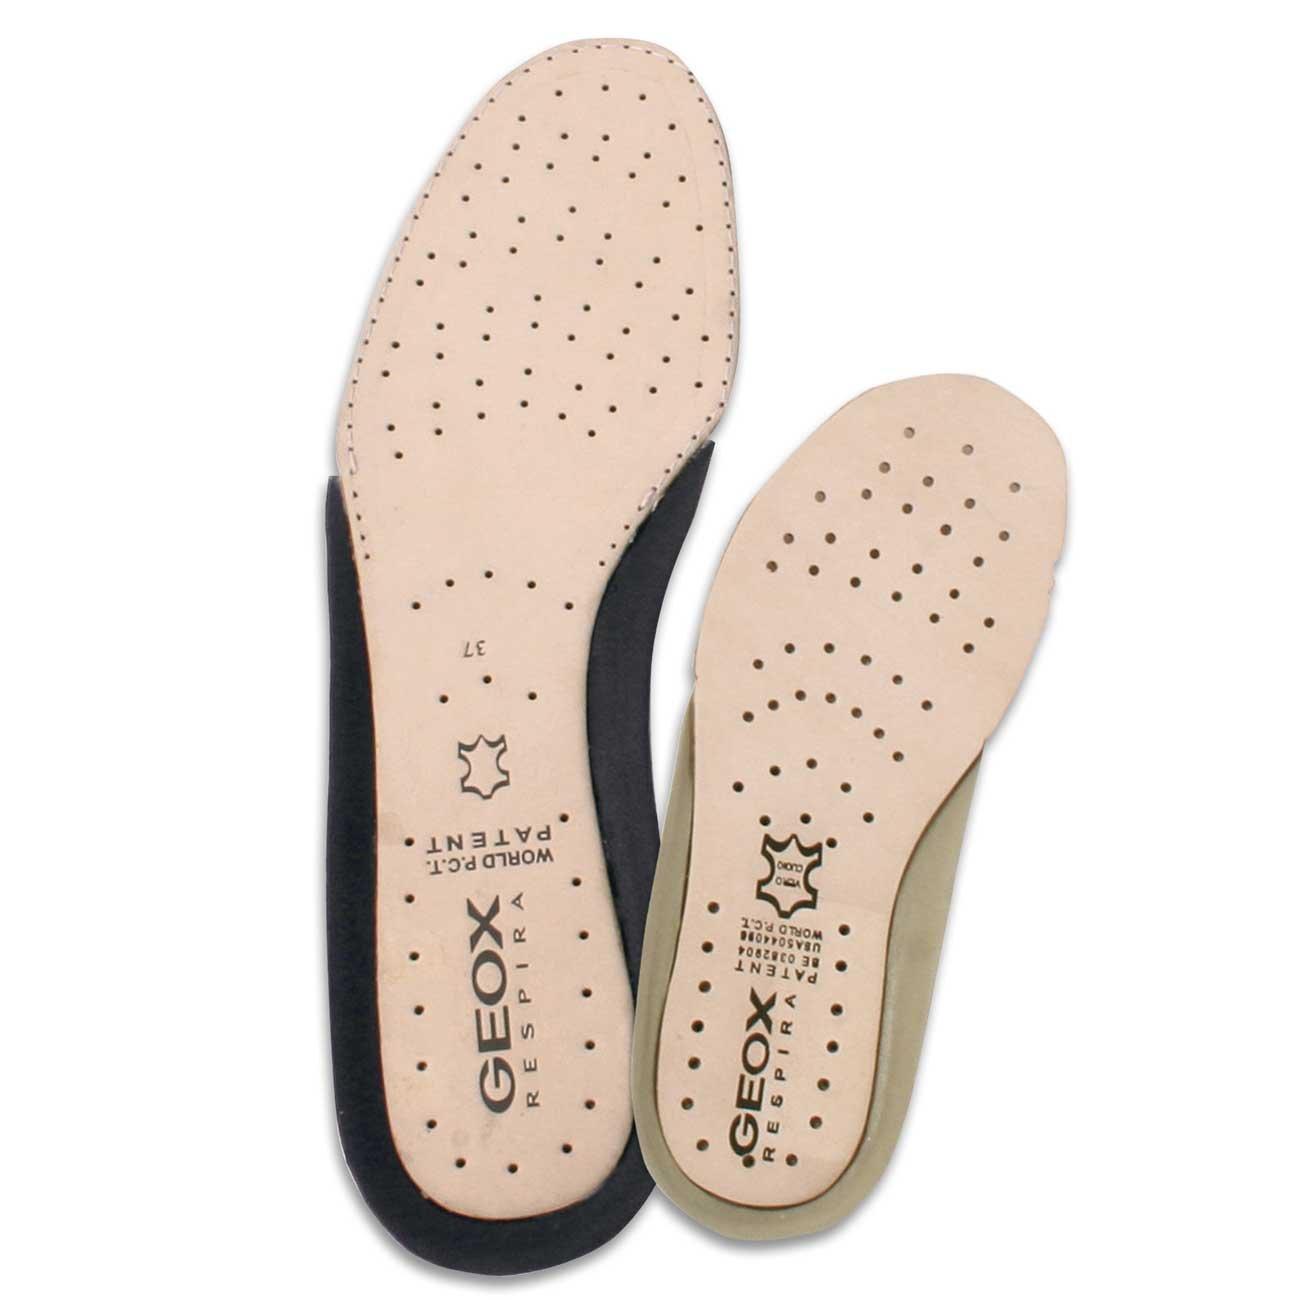 Geox Leder Sohle, Groesse 28: : Schuhe & Handtaschen